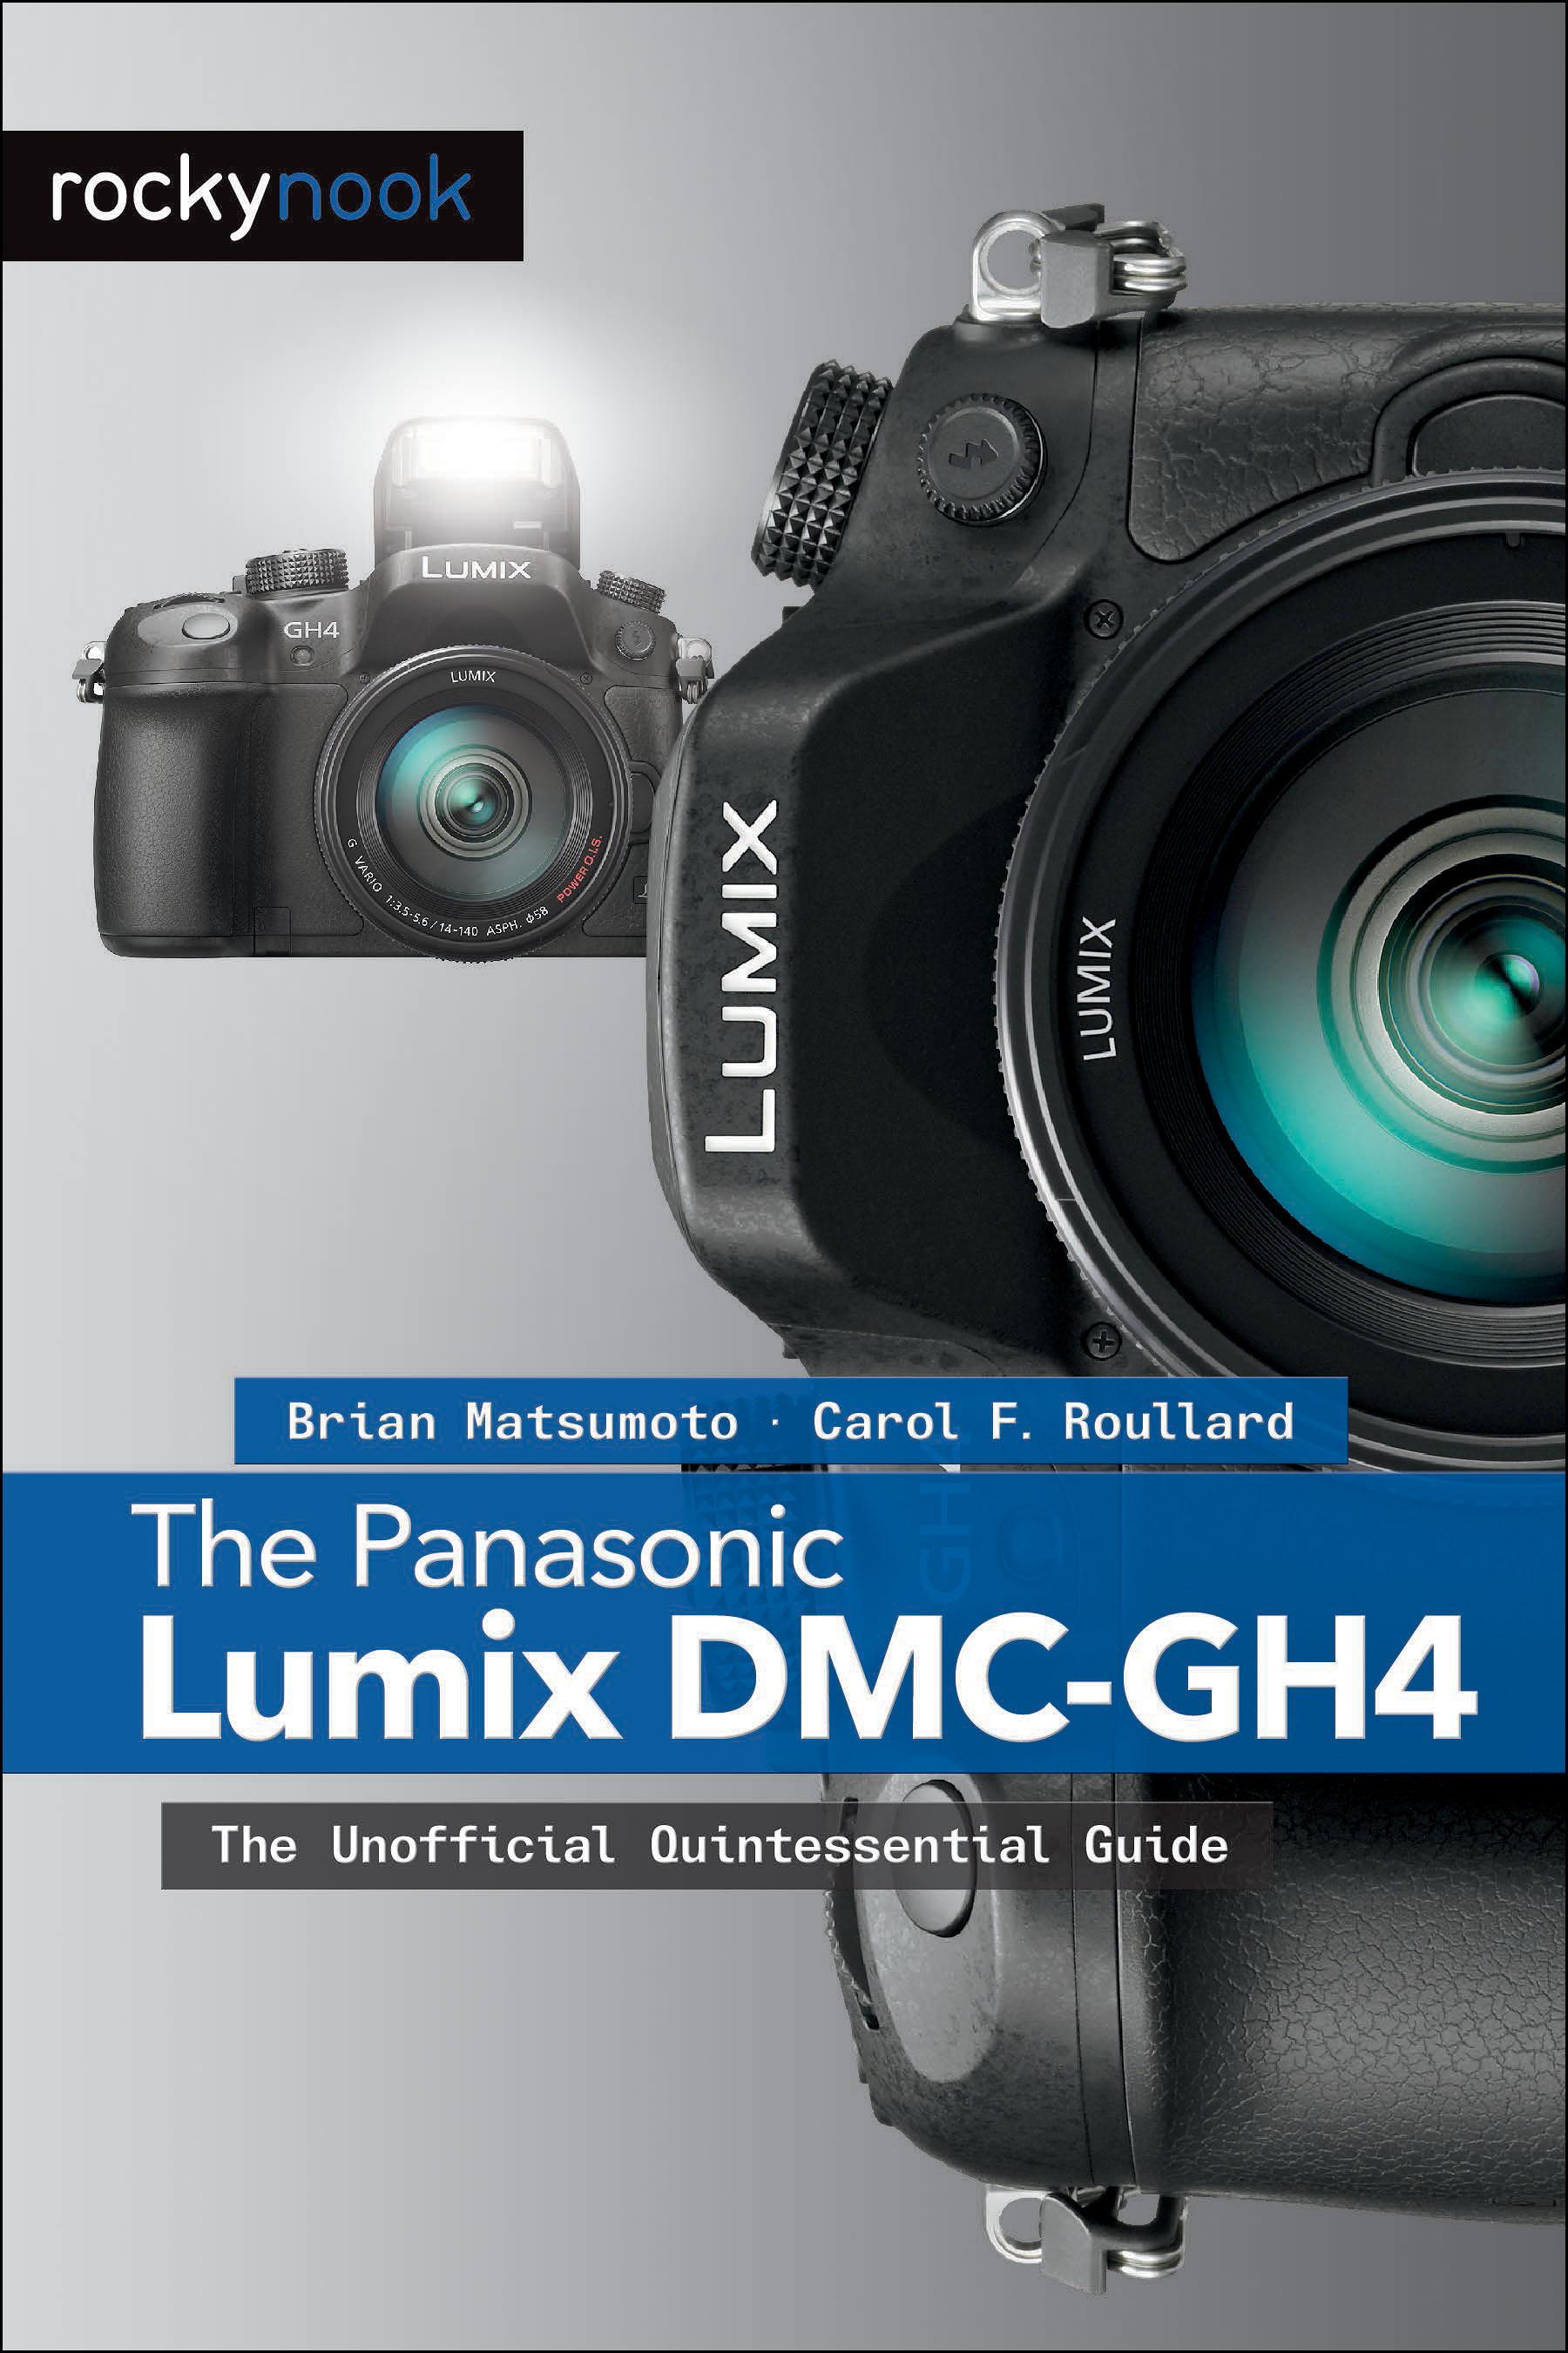 The Panasonic Lumix DMC-GH4 (96504565) photo